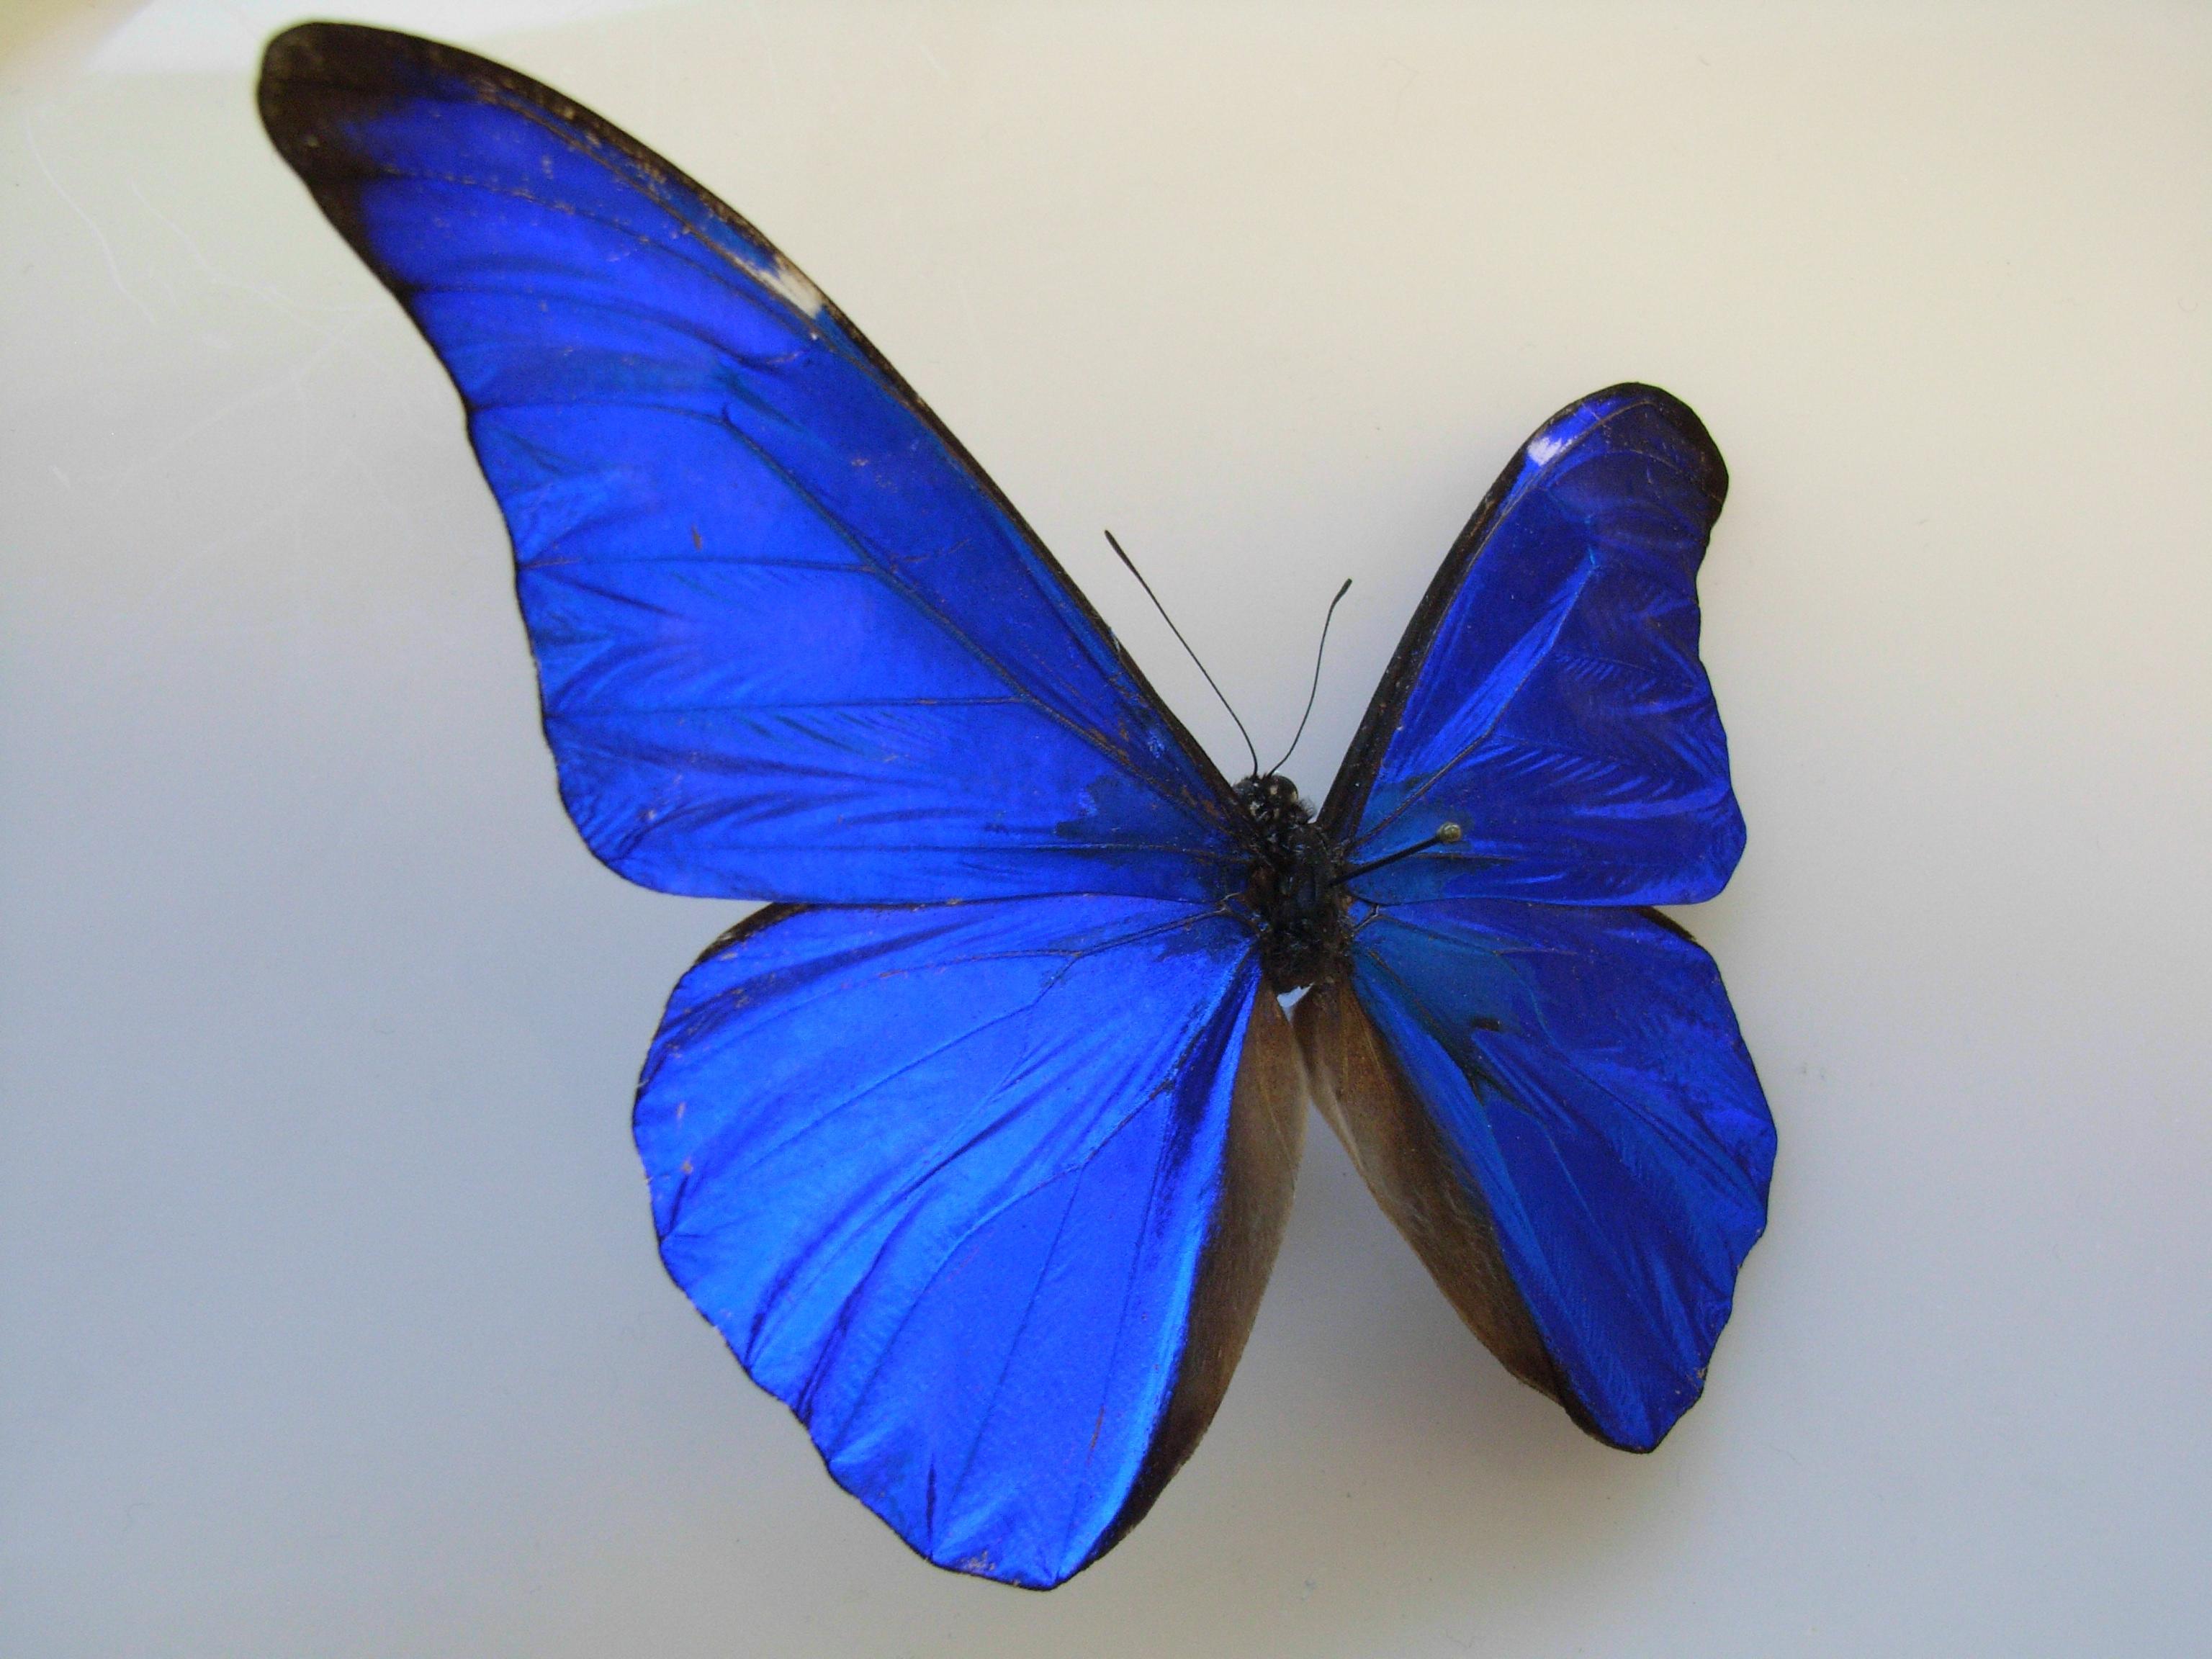 Butterflies of Amazonia - Morpho rhetenor